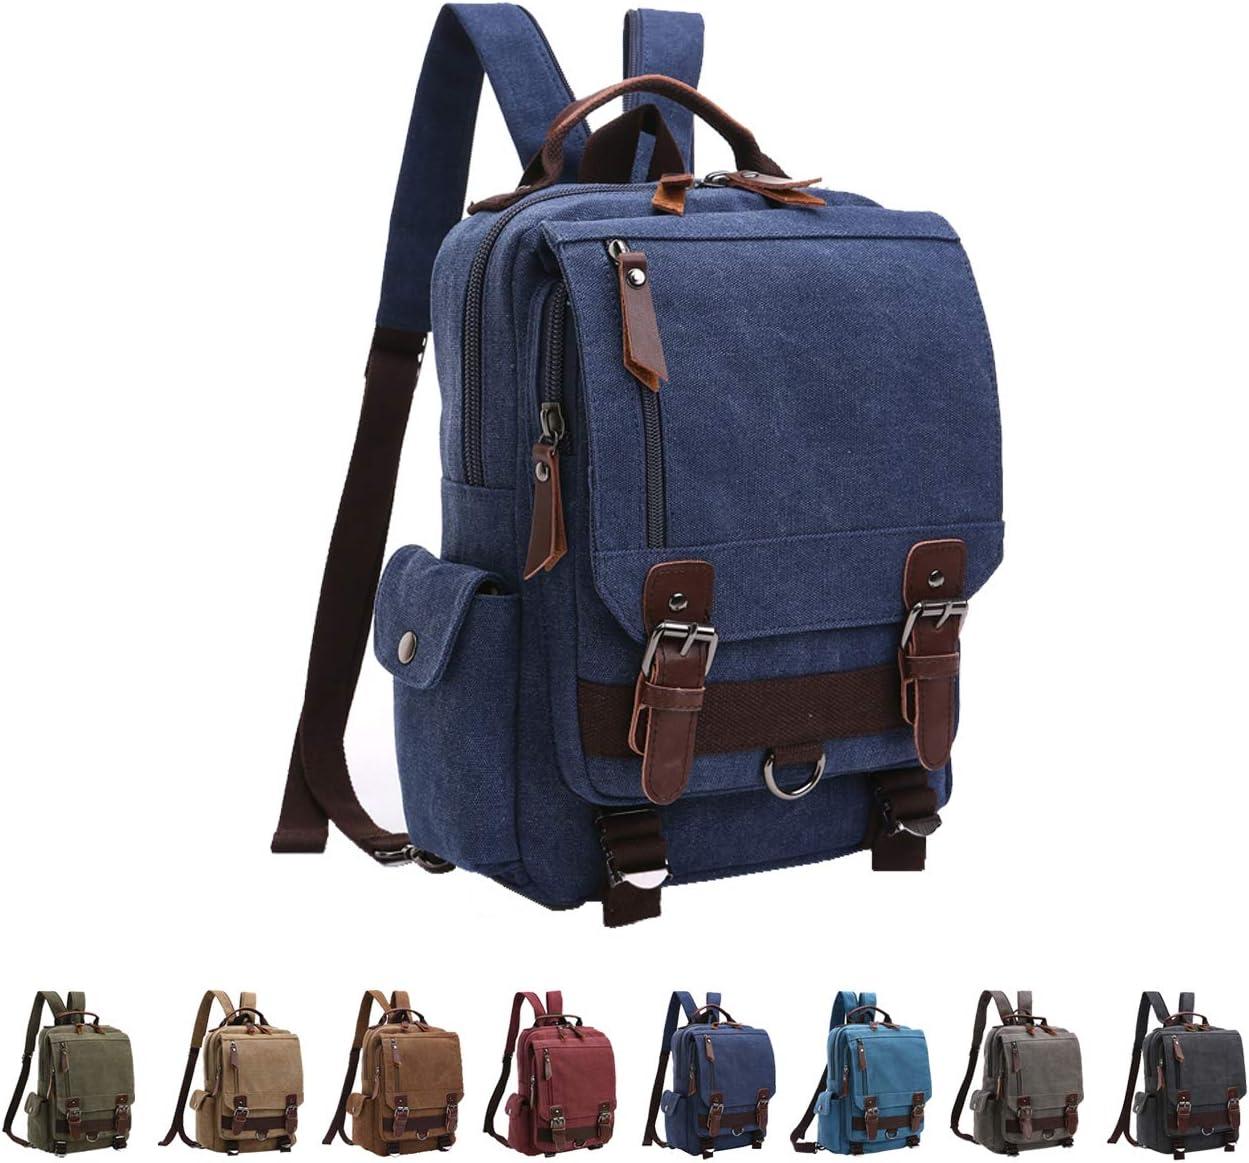 Popular product Queenie - Unisex Canvas New York Mall Cross Sling Bag Backp Messenger Body